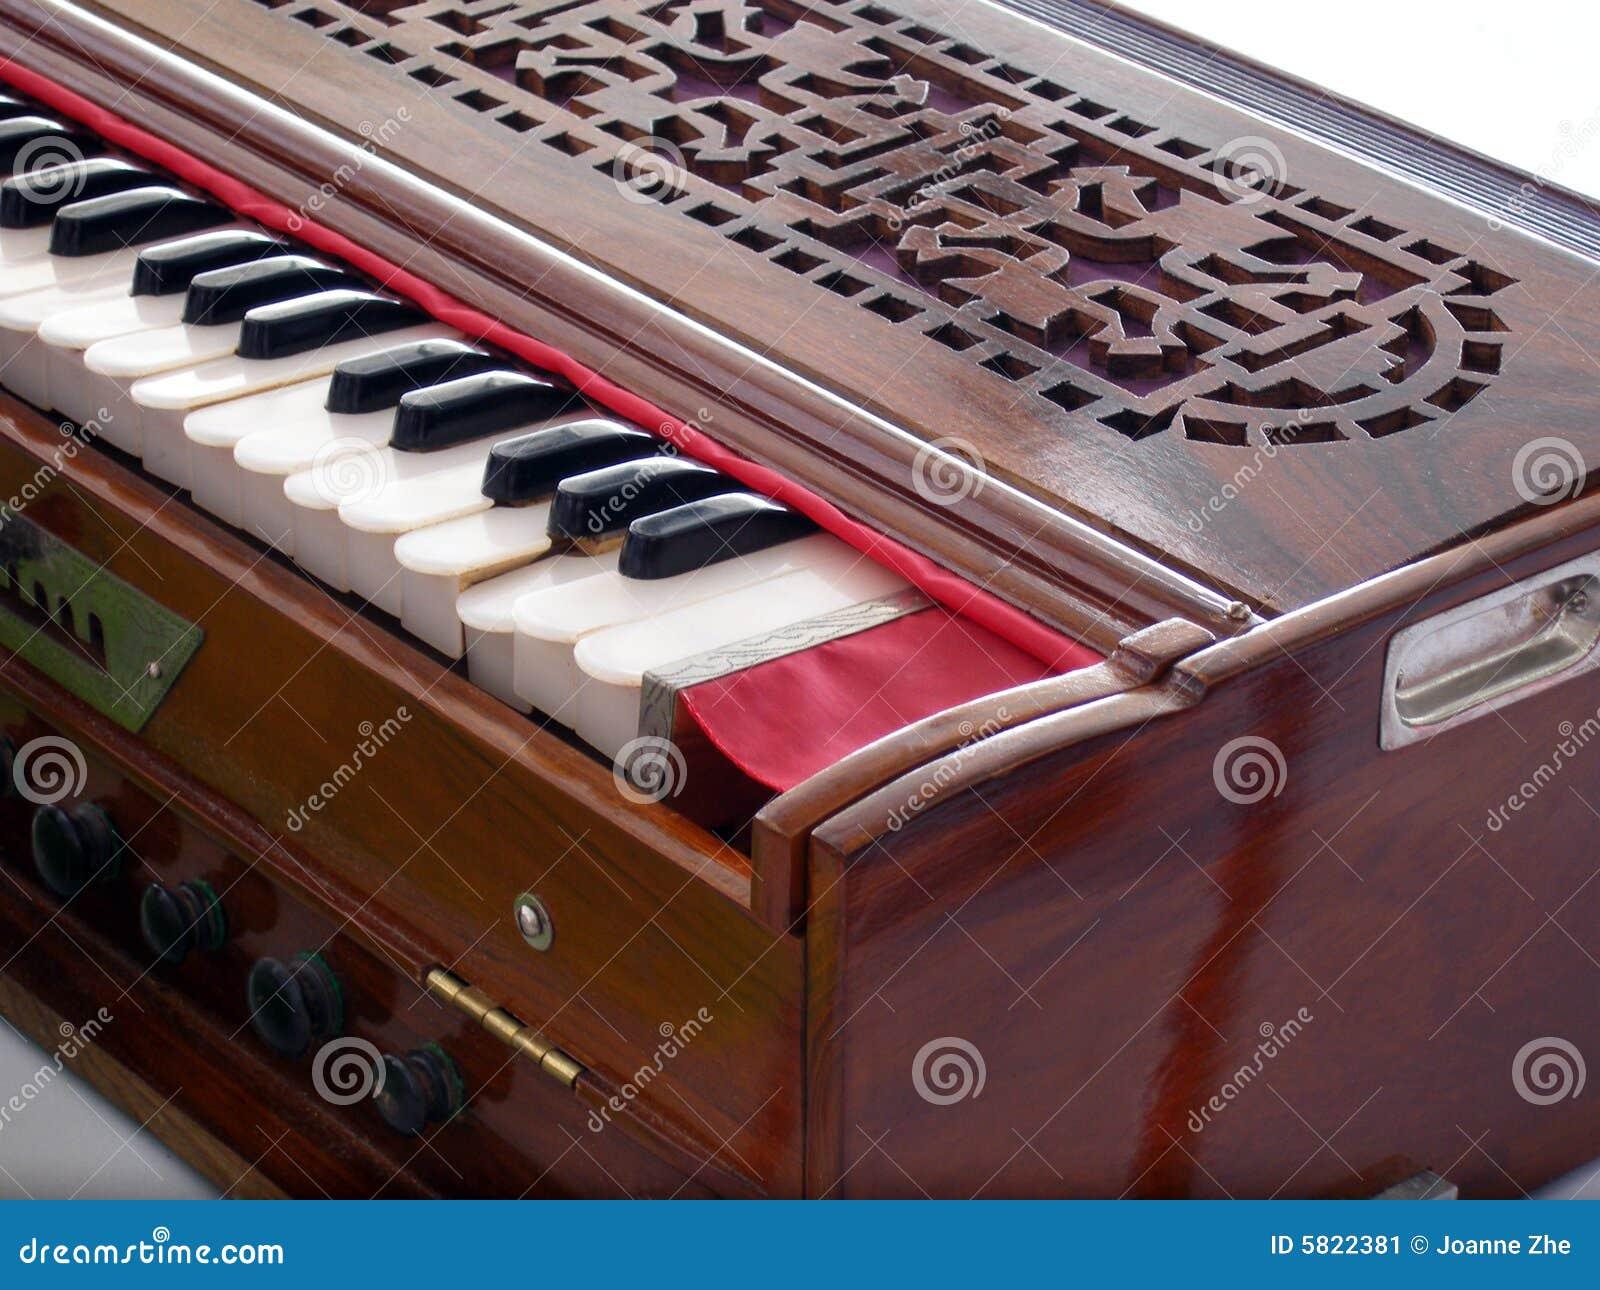 Antique vintage harmonium stock image  Image of horizontal